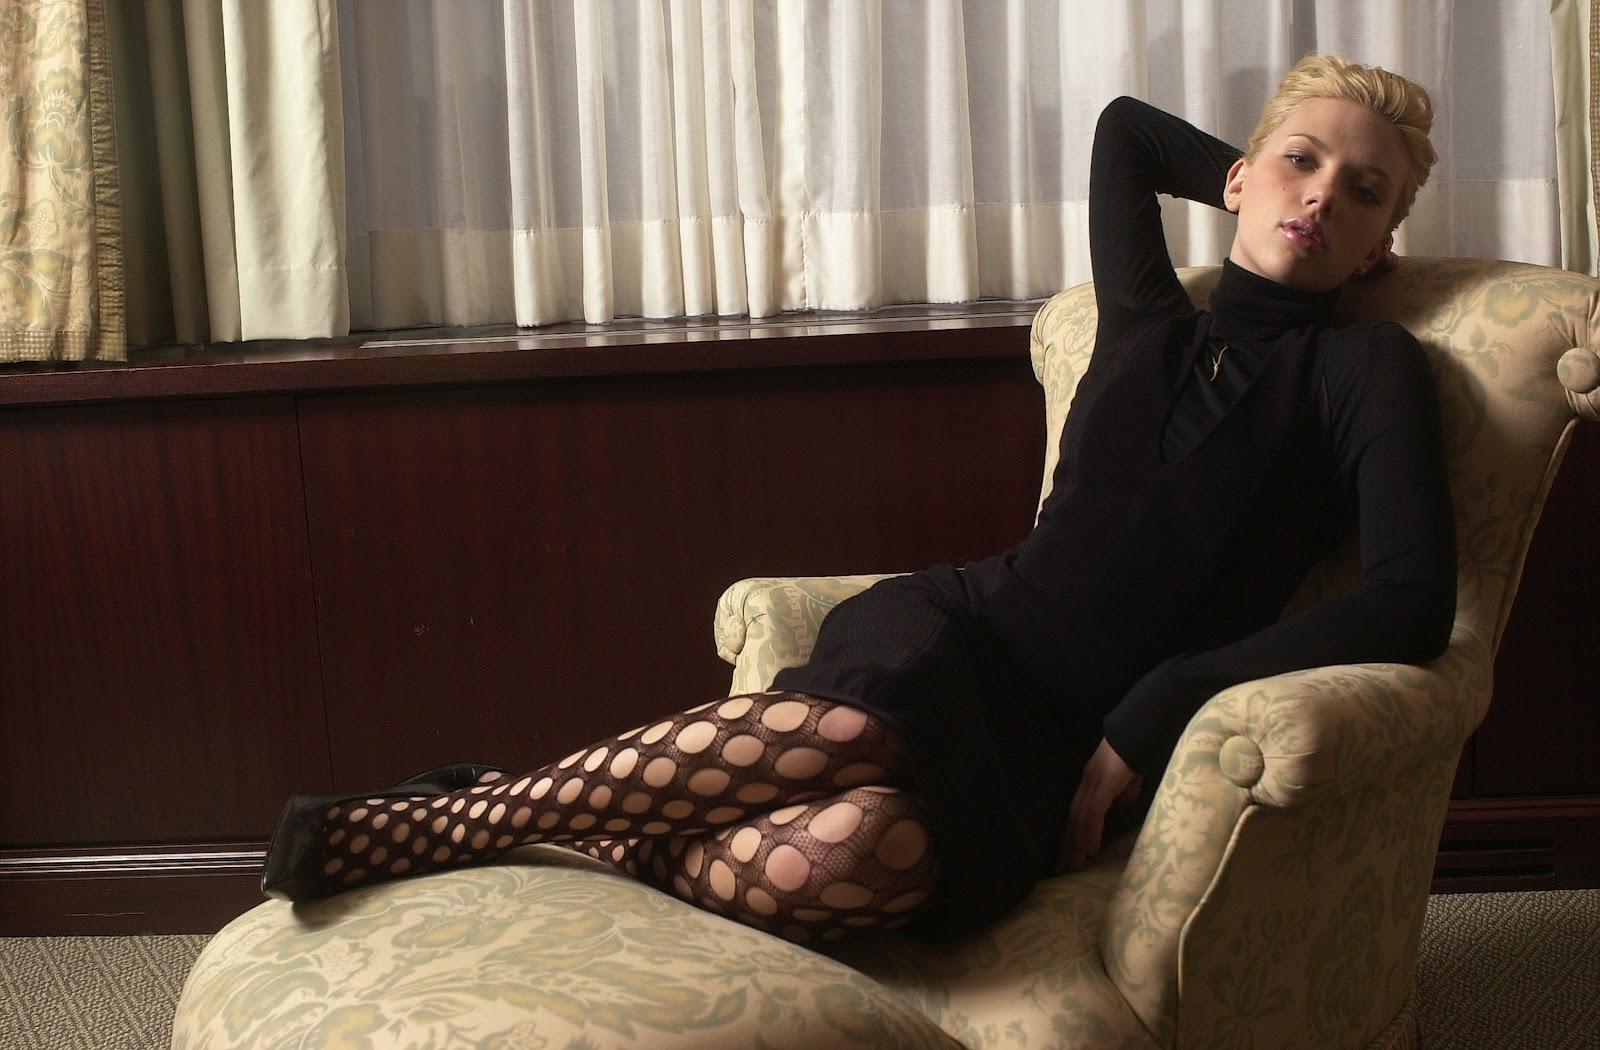 from Anders scarlett johansson in stockings